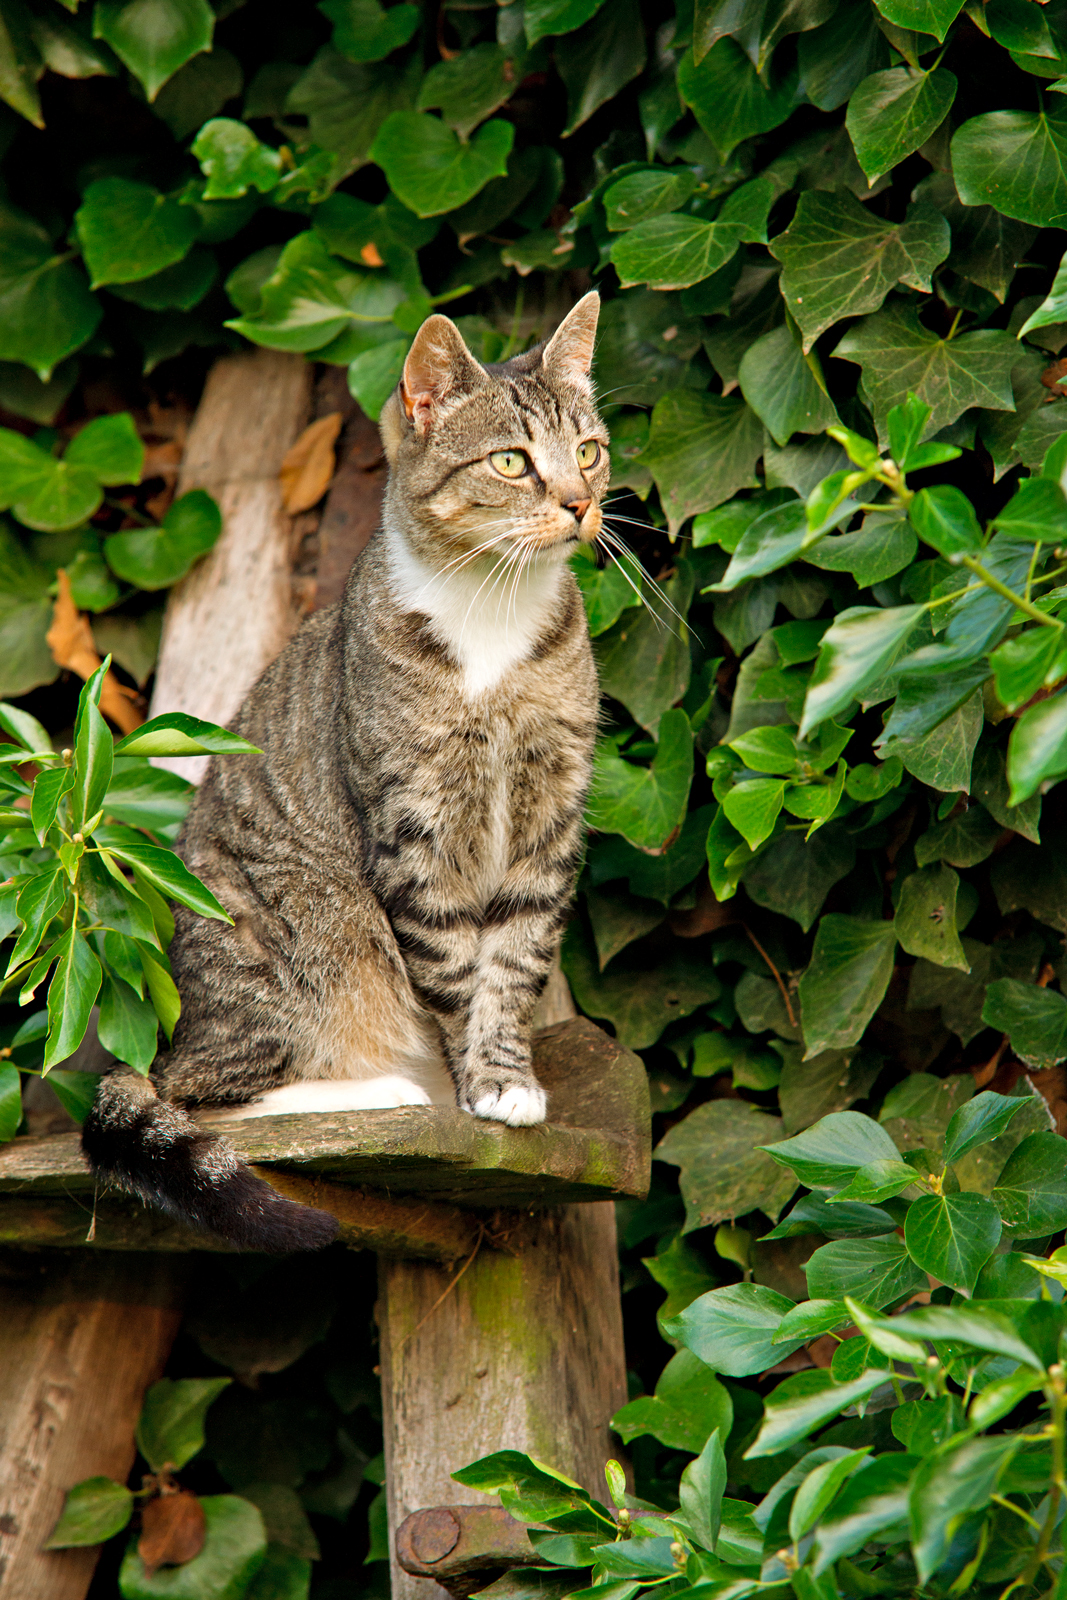 Katze-auf-Ansitz